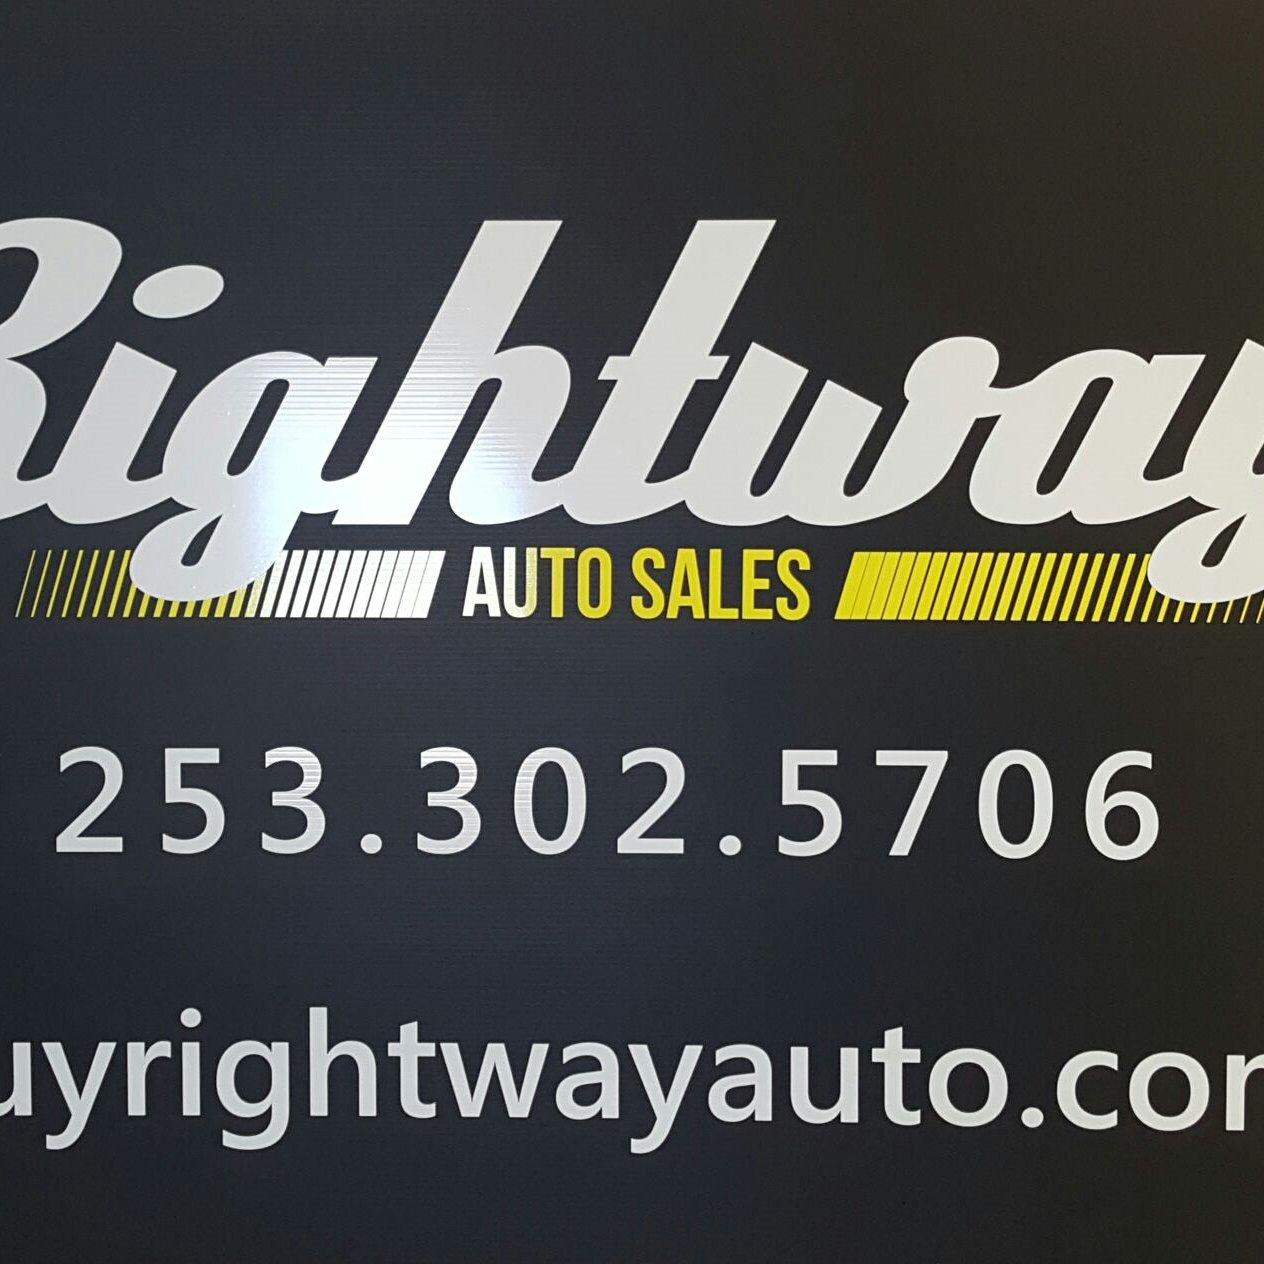 Rightway Auto Sales >> Rightway Auto Sales Therightwayauto Twitter